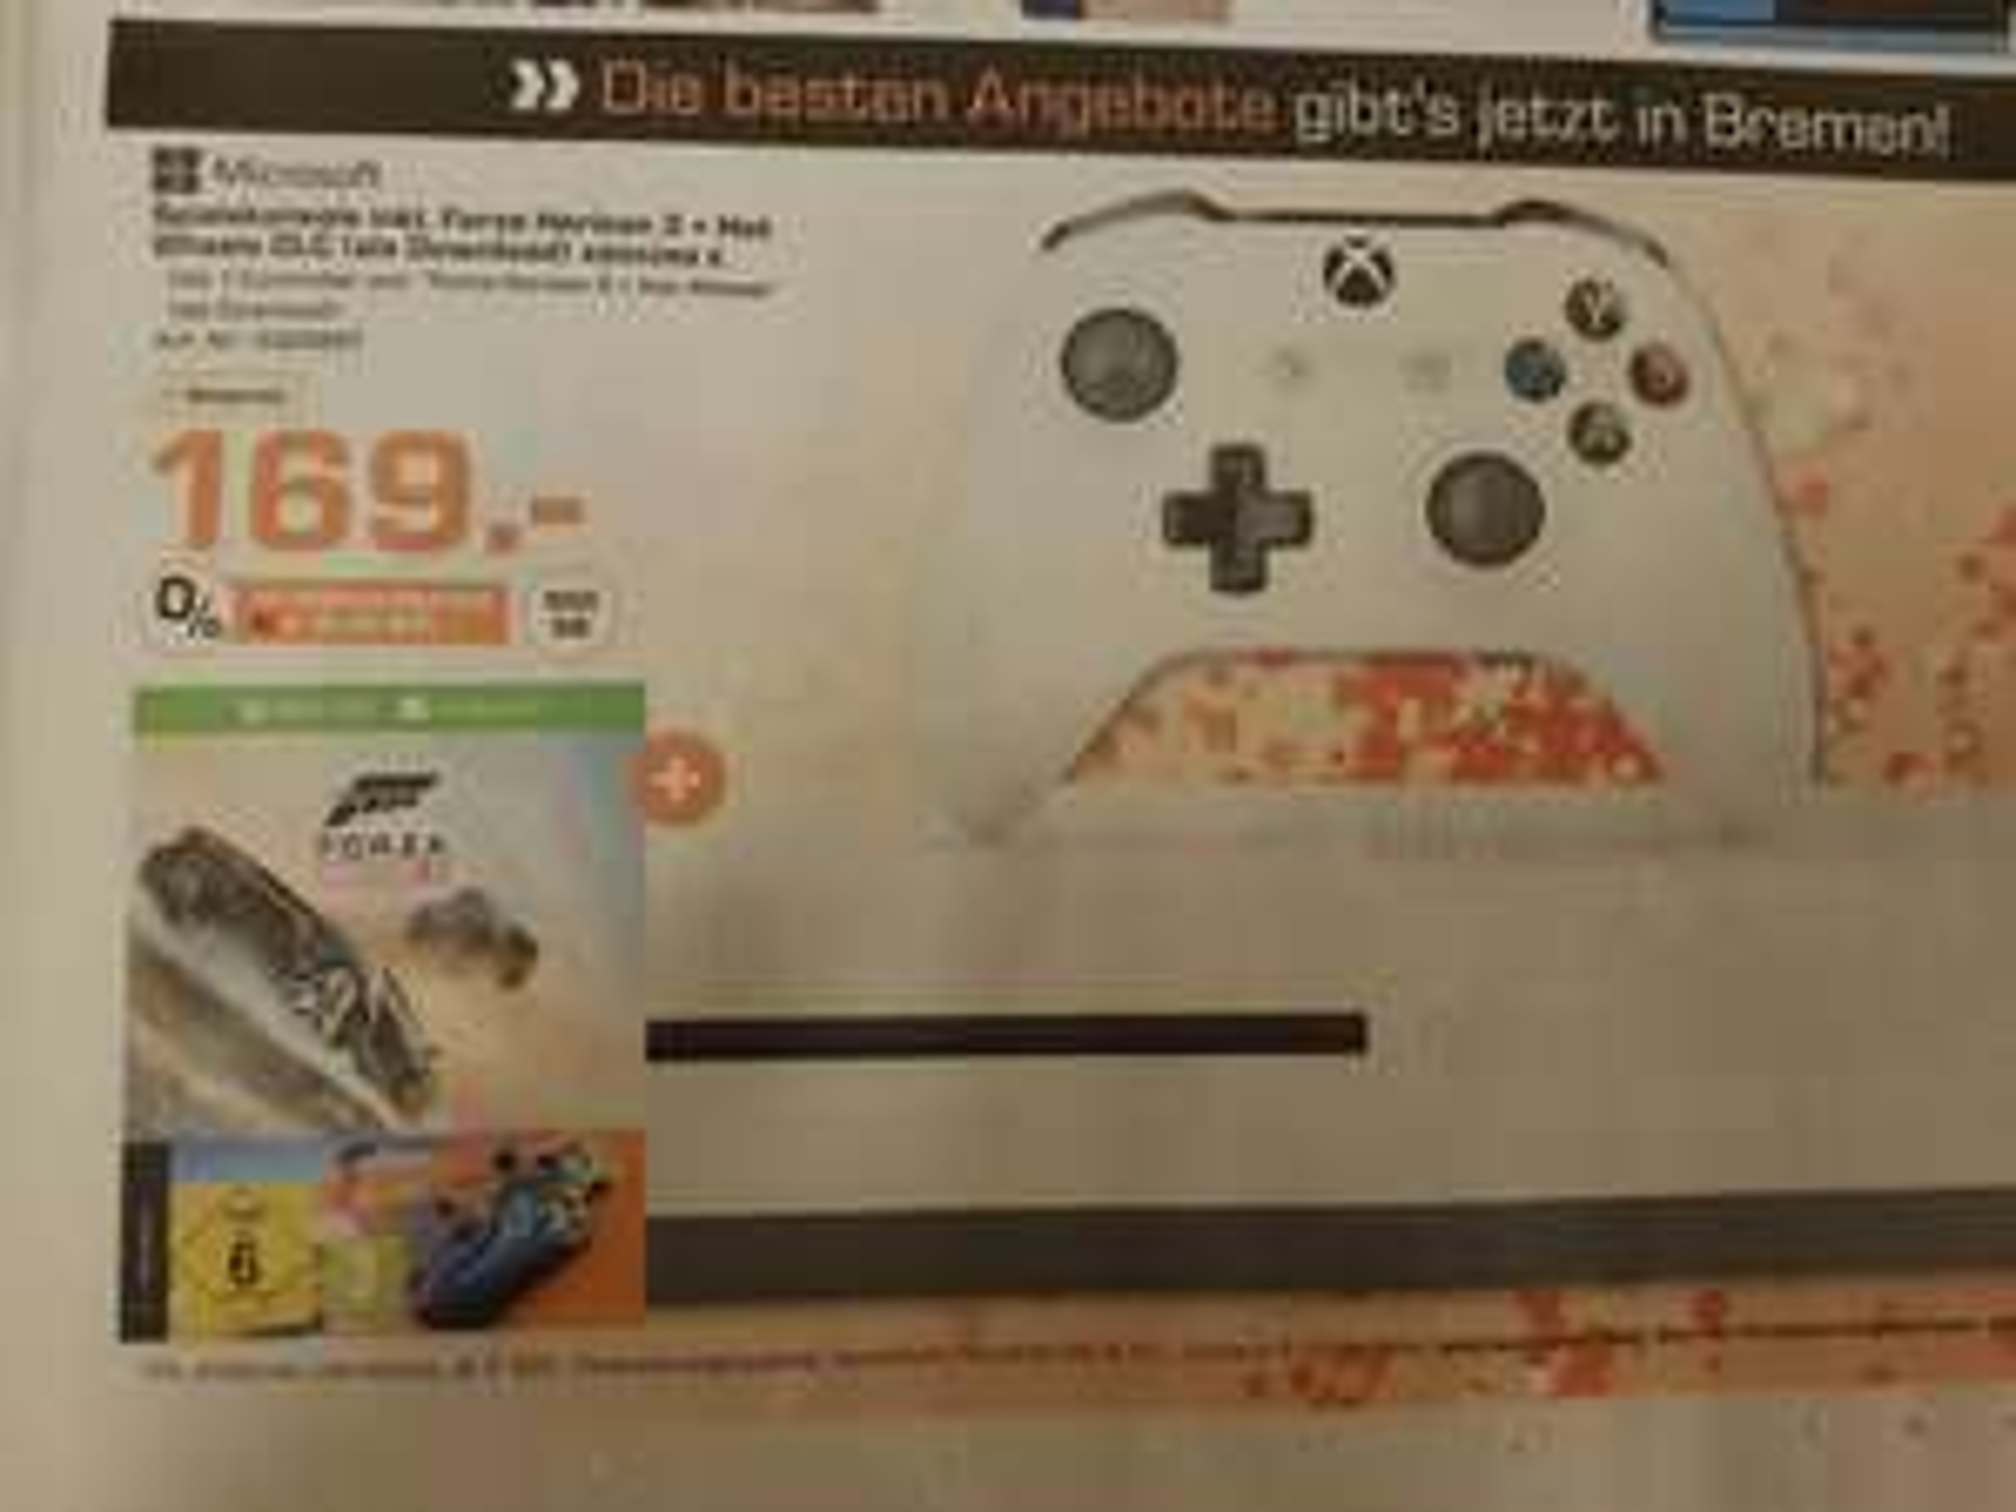 [Lokal] Saturn Bremen Xbox One S inkl. Forza Horizon 3 + Hot Wheels DLC